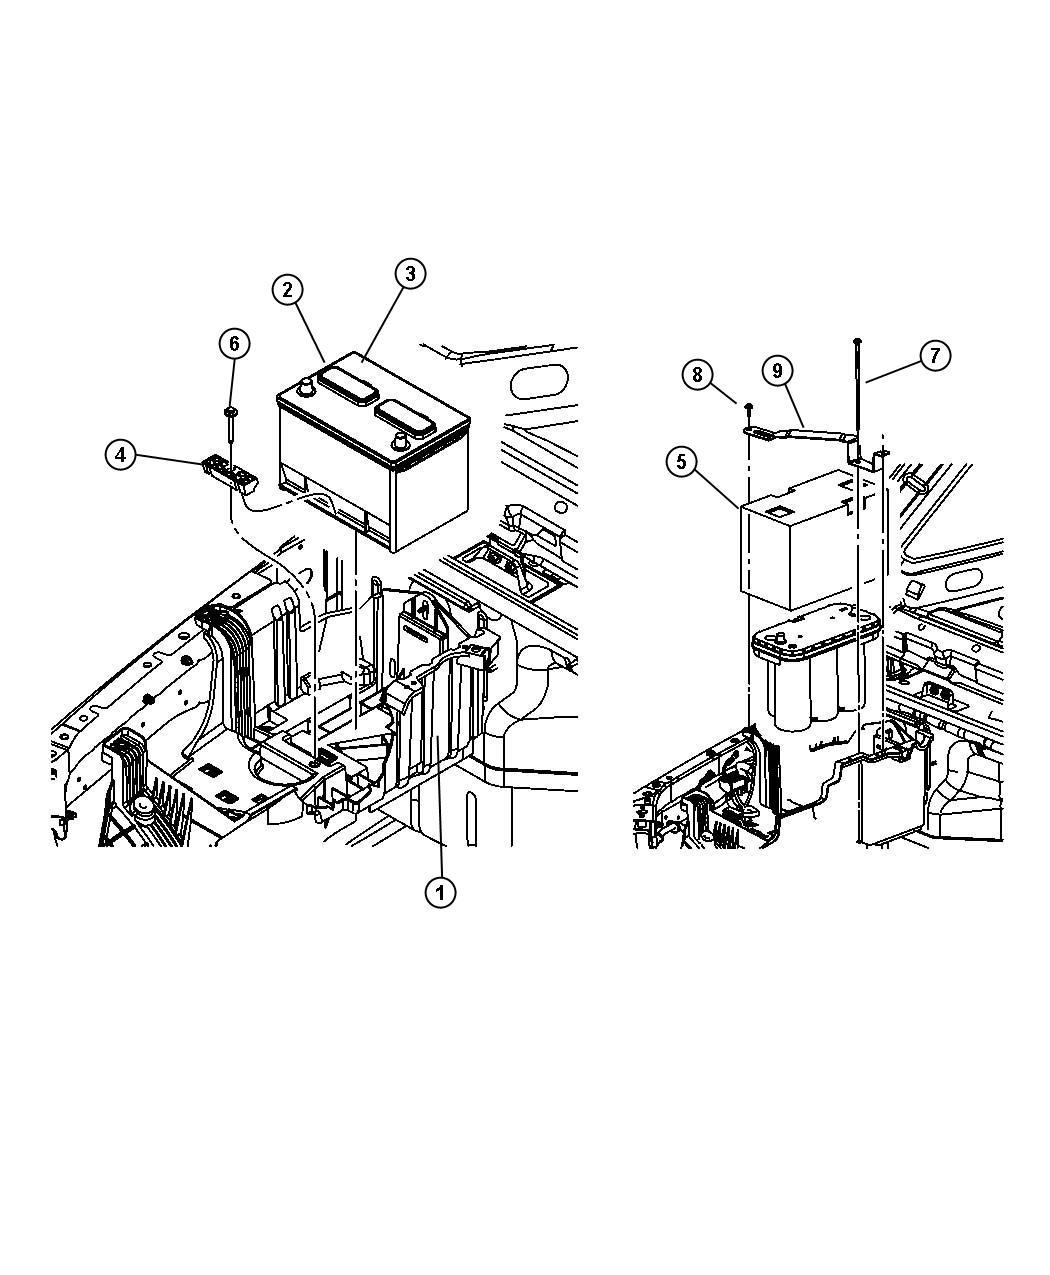 Jeep Wrangler Battery Storage Europe Export 825 Amp